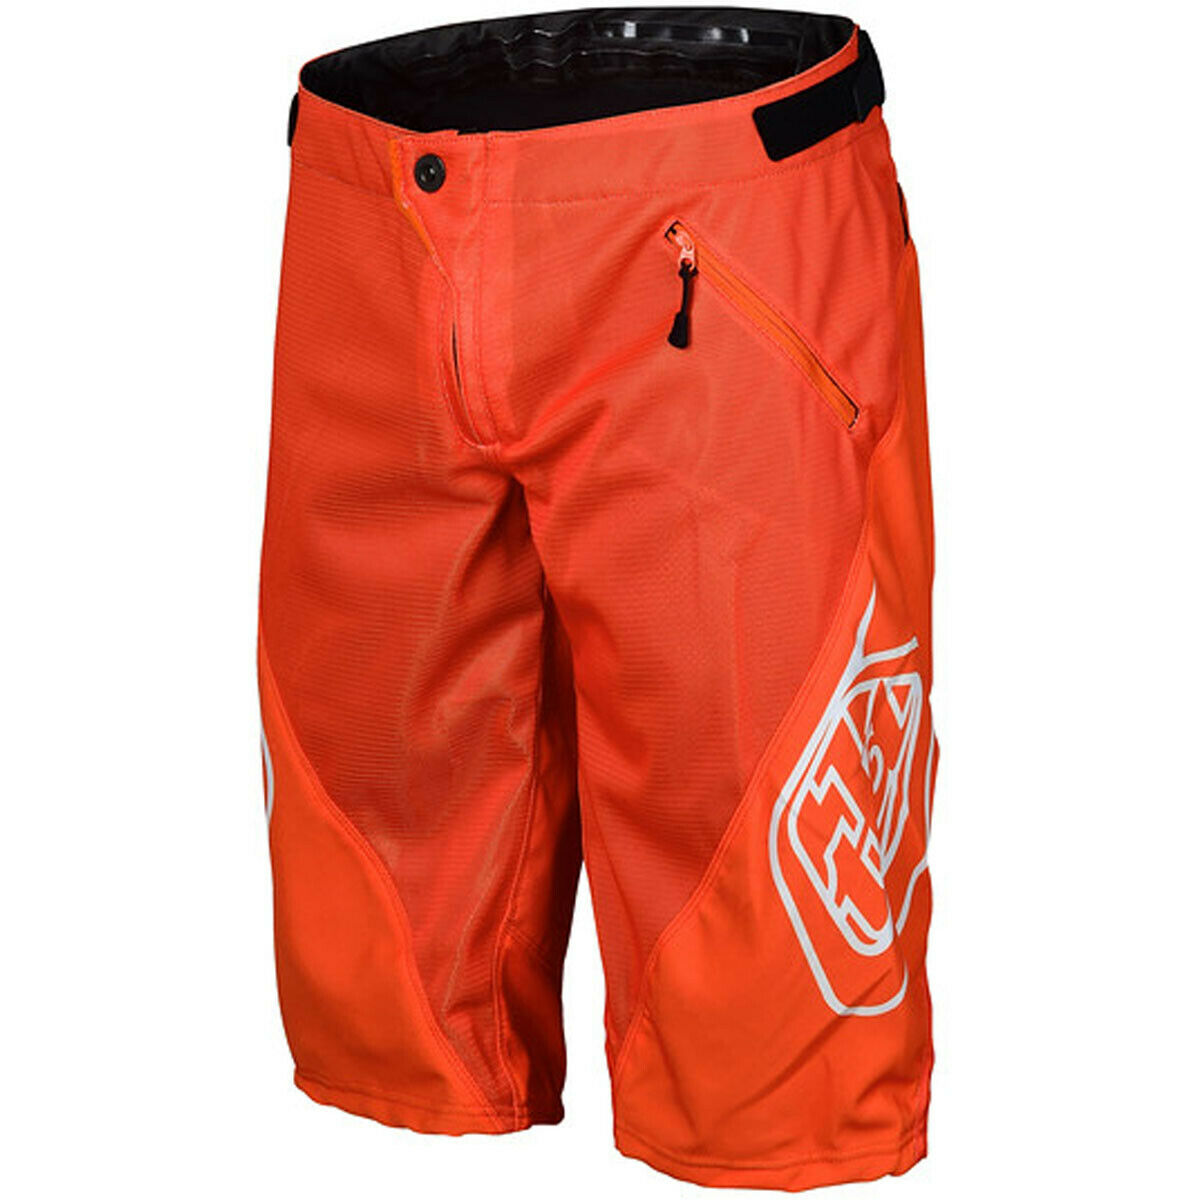 Troy Lee Lee Lee TLD Uomo Designs Mountain Bike Downhill Ciclismo Pantaloncini Sprint Arancione Taglia 30 a13